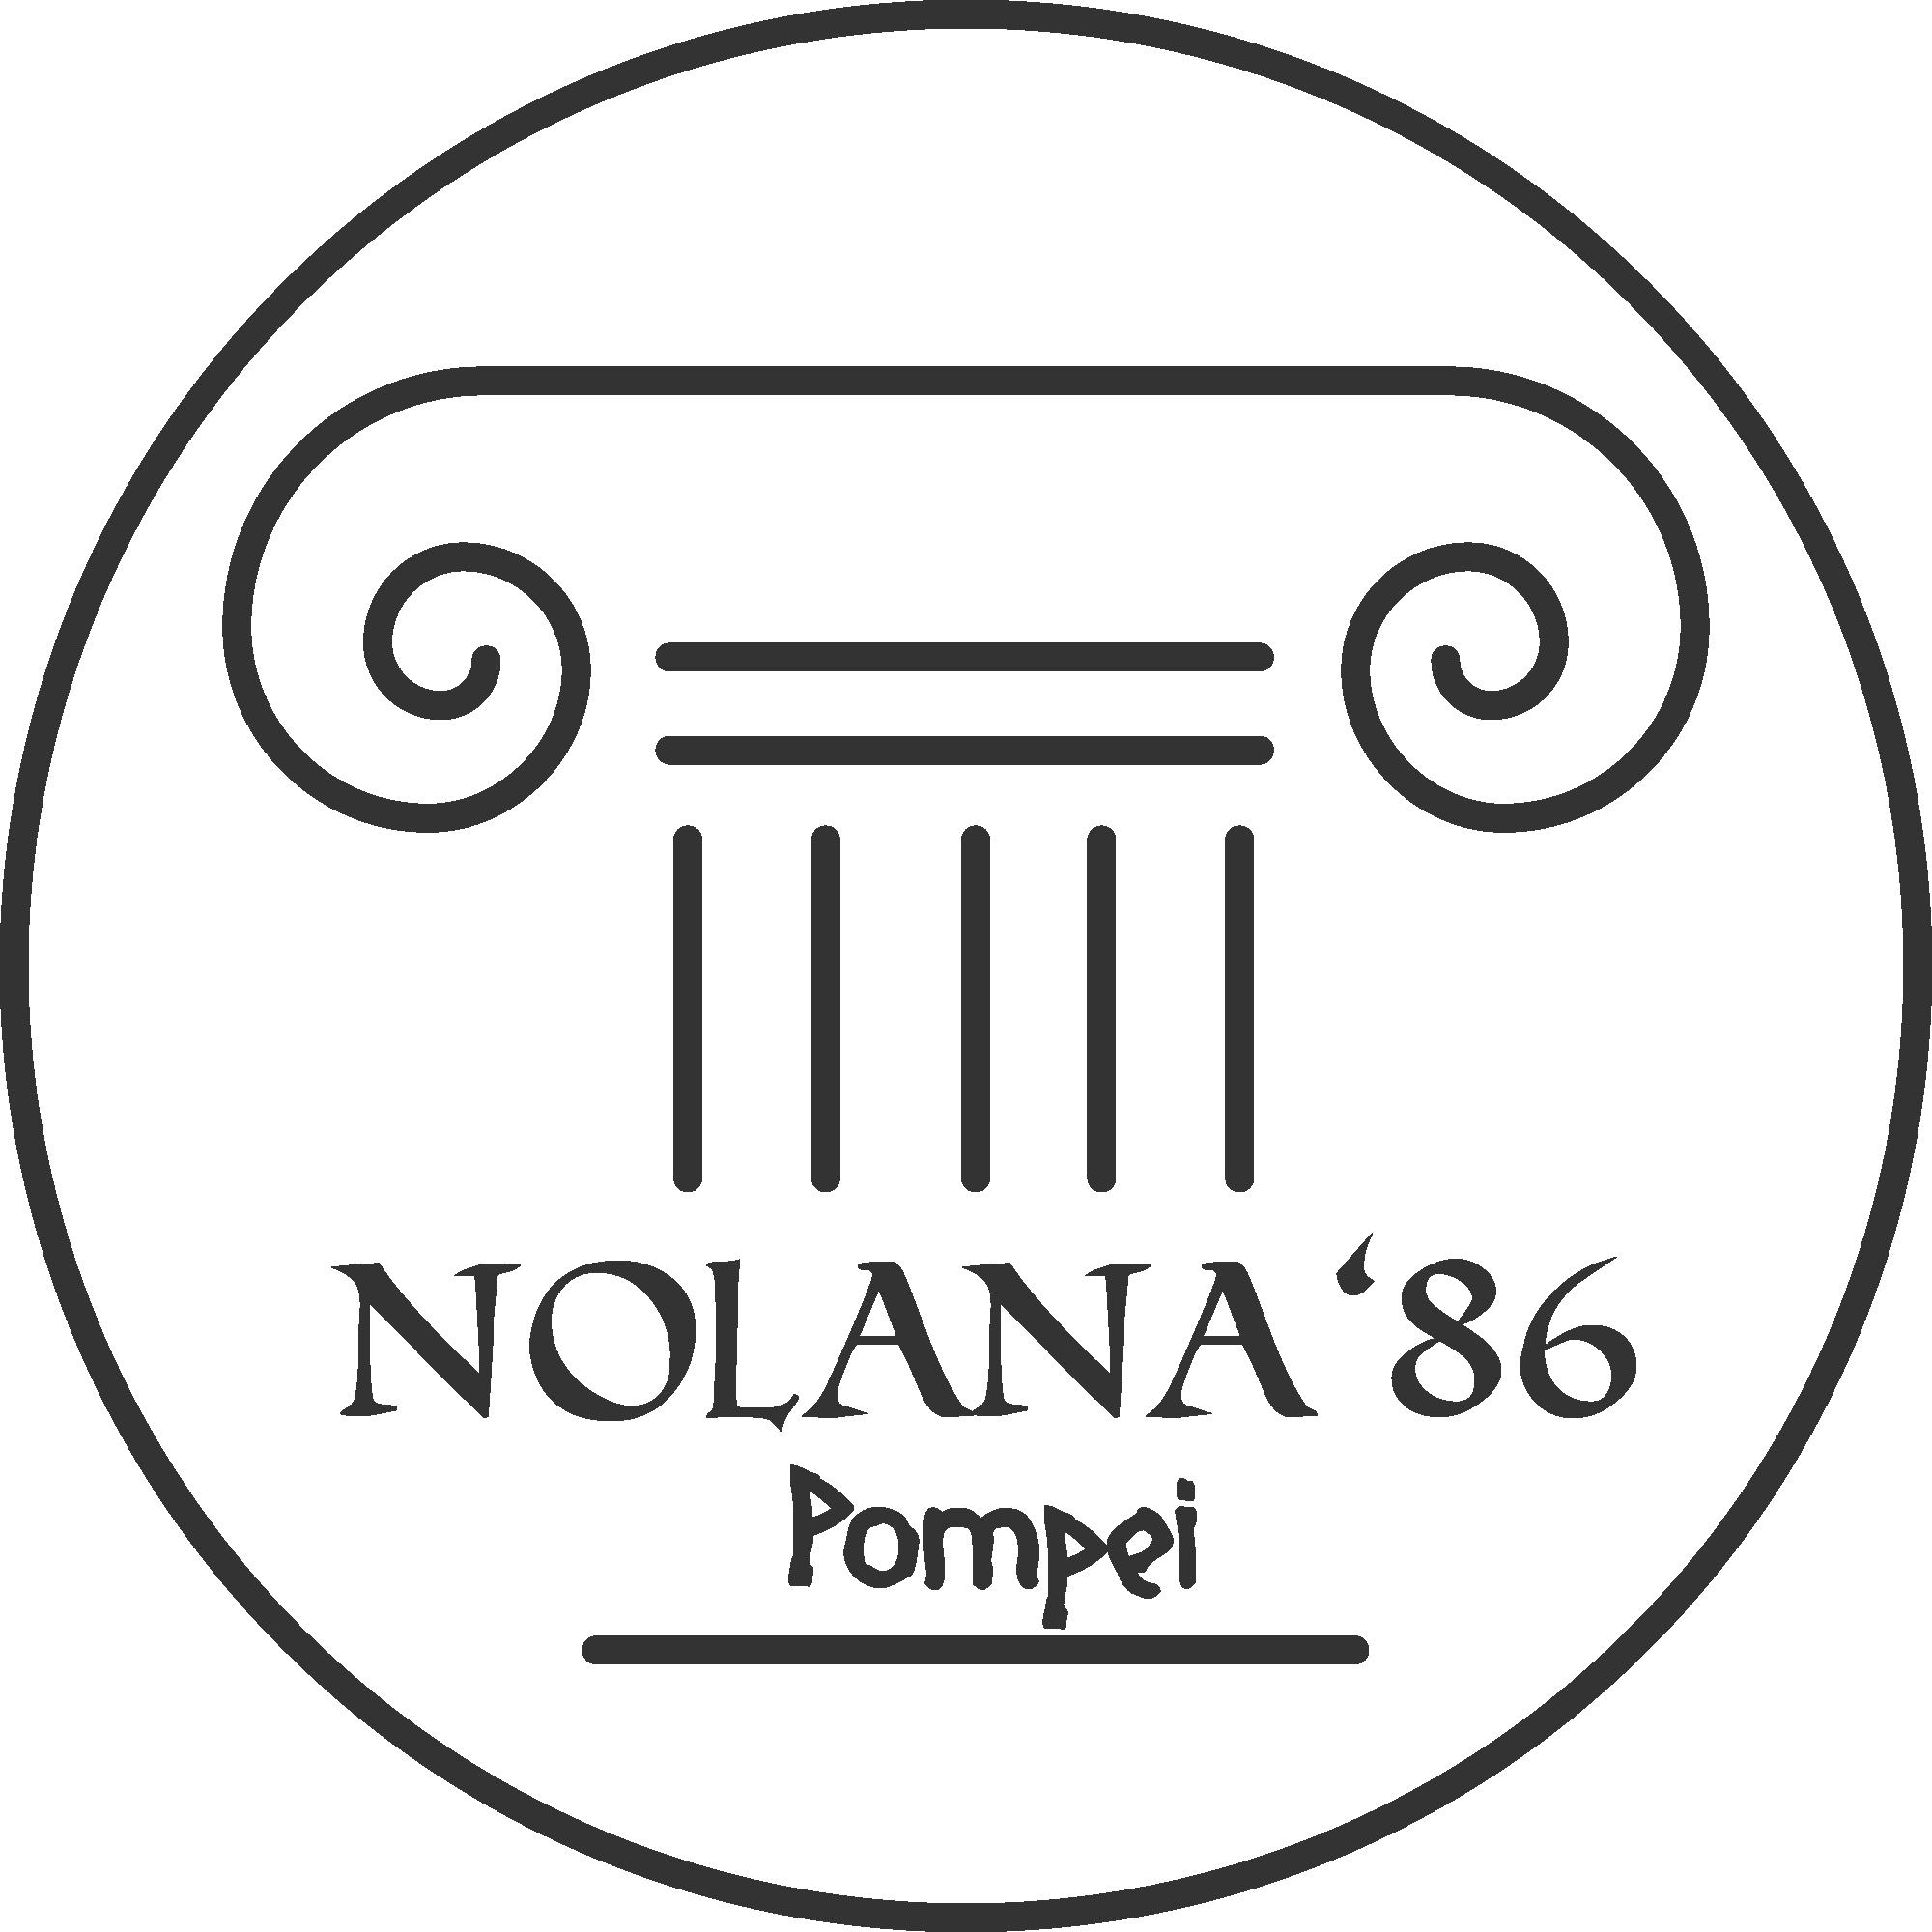 B&B Nolana 86